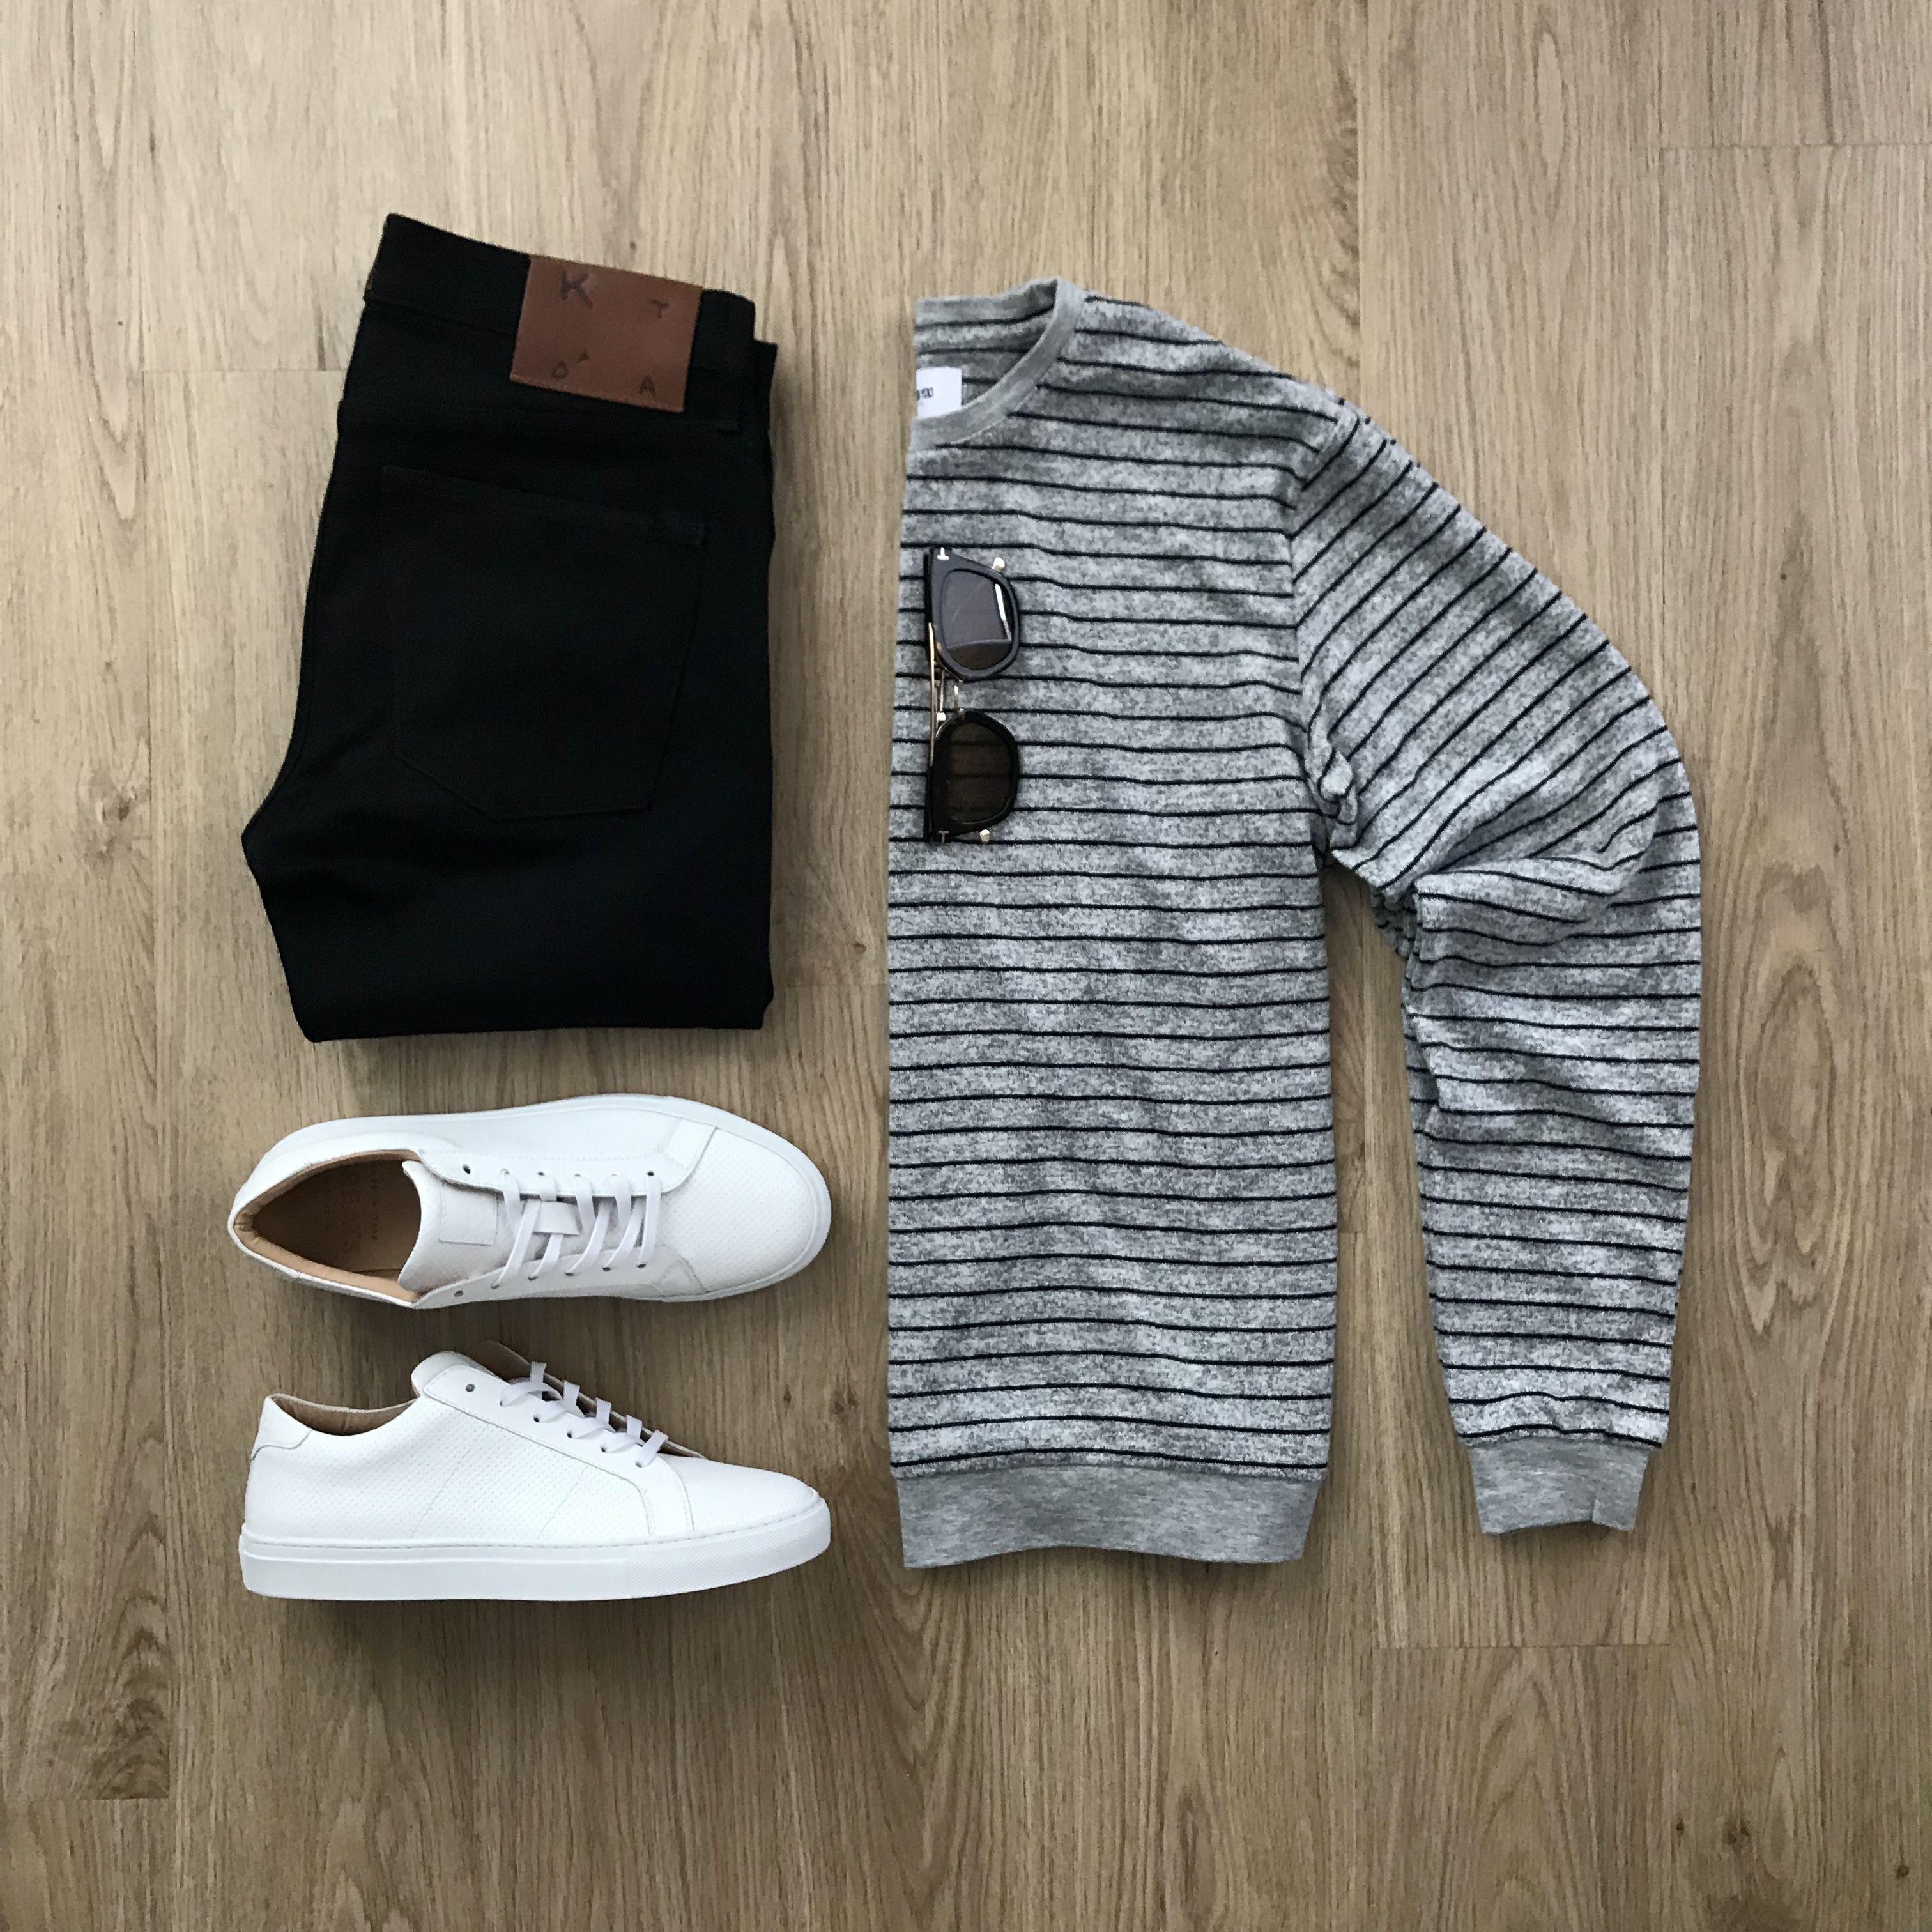 Combinações Masculinas   Moda masculina casual, Moda